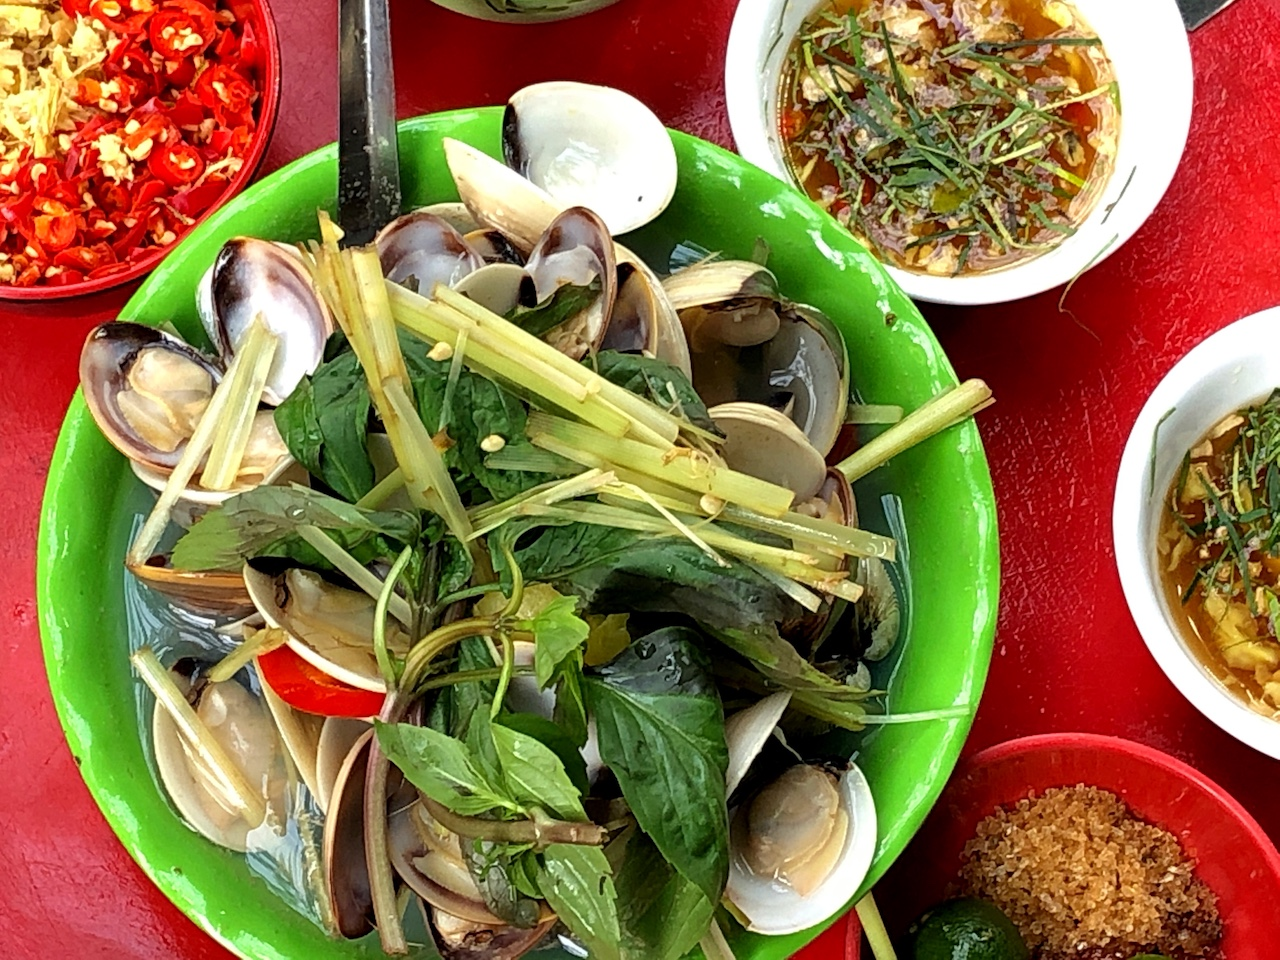 Hanoi street food Bun Cha 46 phat loc